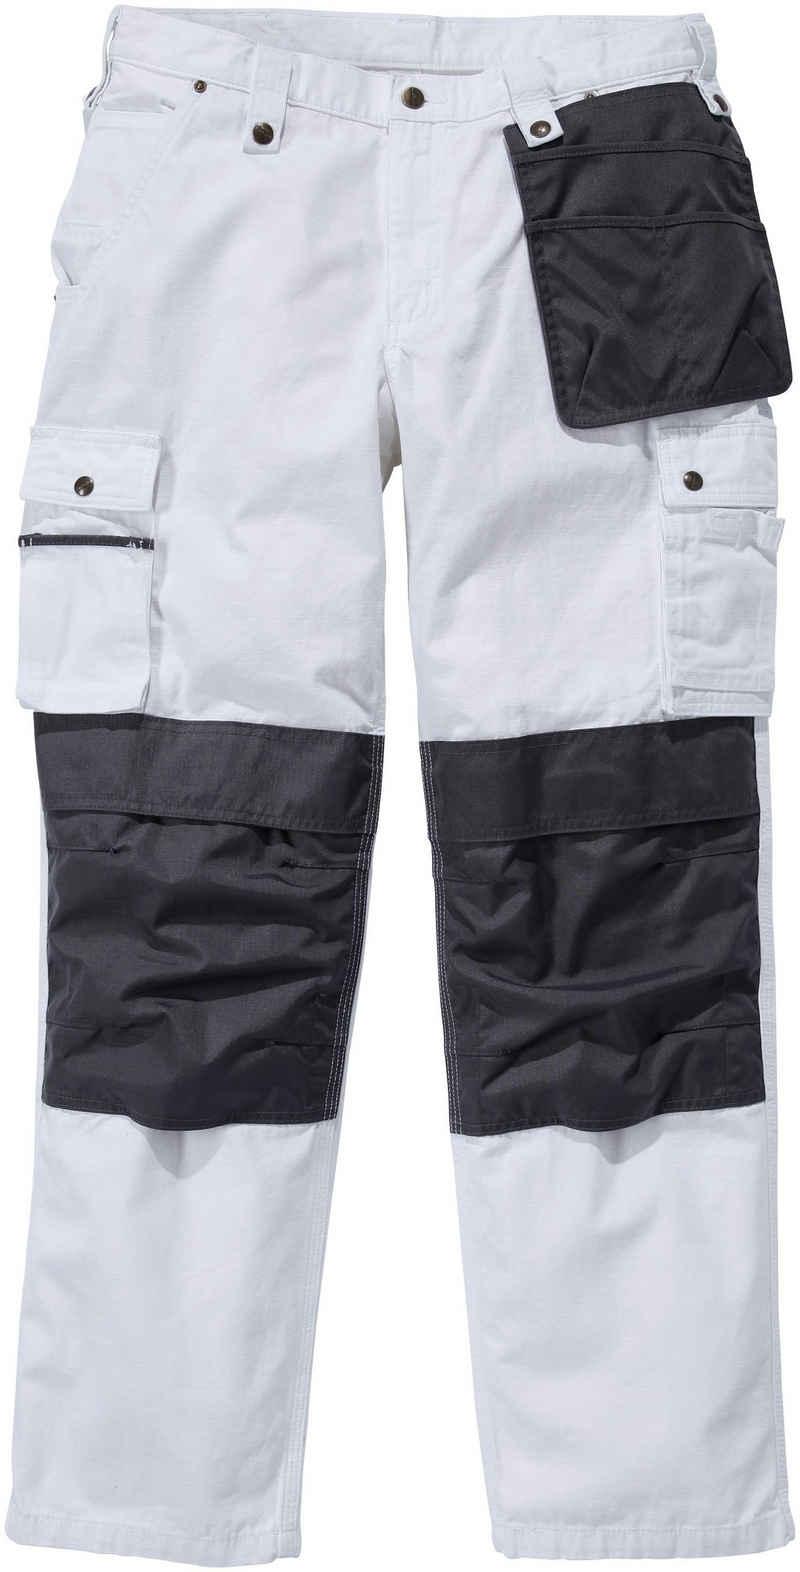 Carhartt Arbeitshose »Multi Pocket Ripstop Pants« mit demontierbaren Vordertaschen